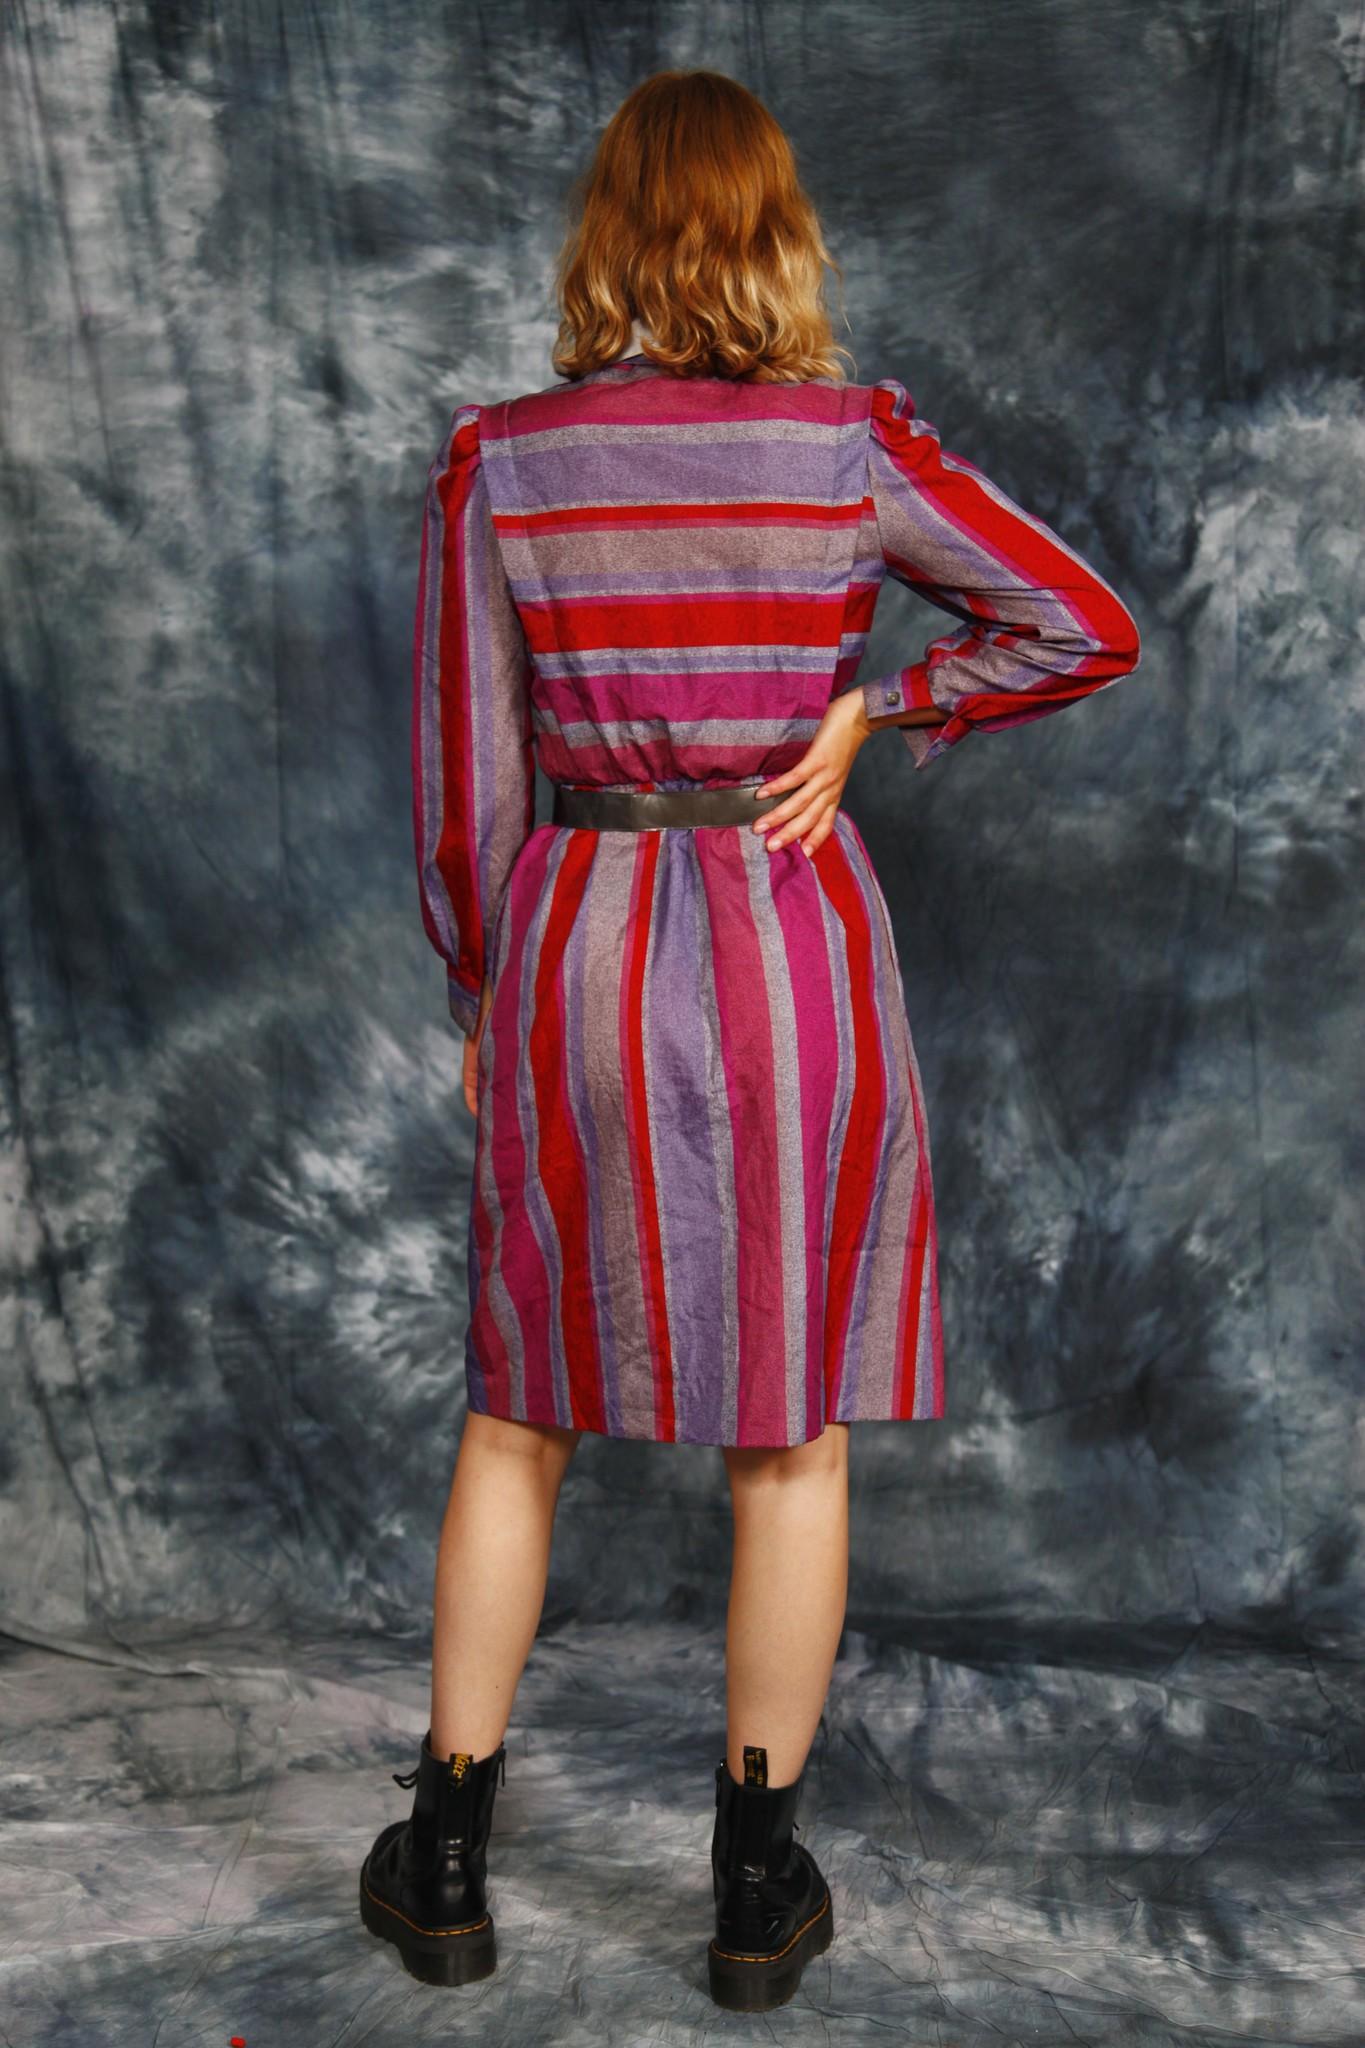 Classy 80s dress